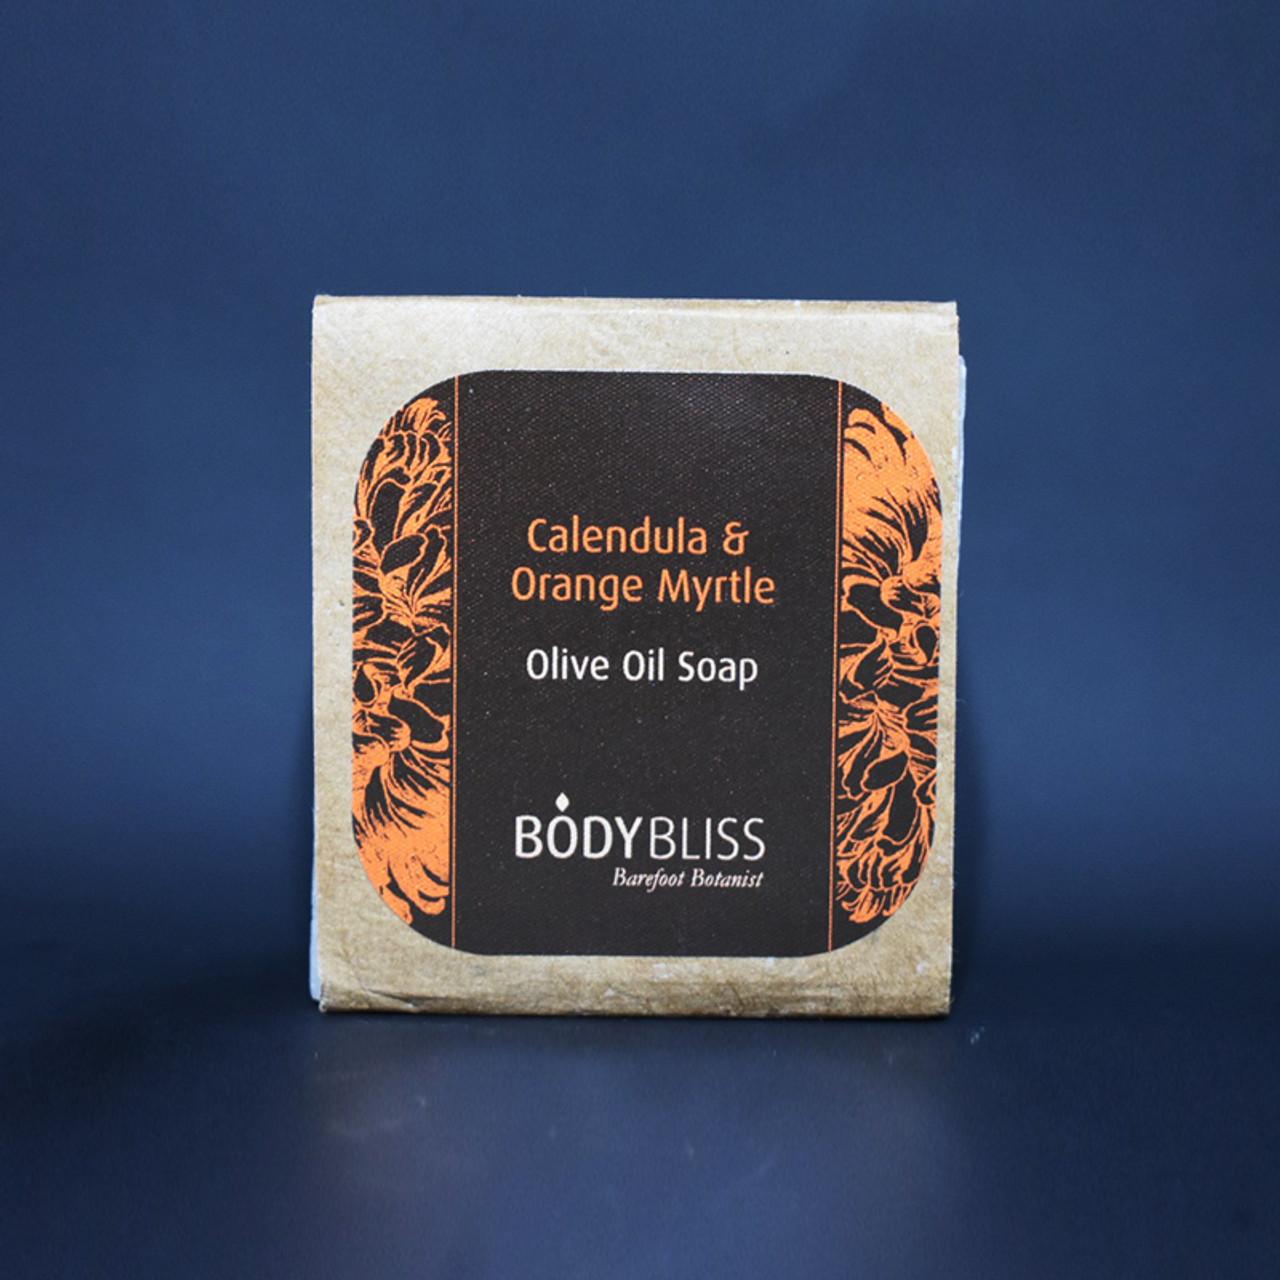 Calendula & Orange Myrtle Olive Oil Soap